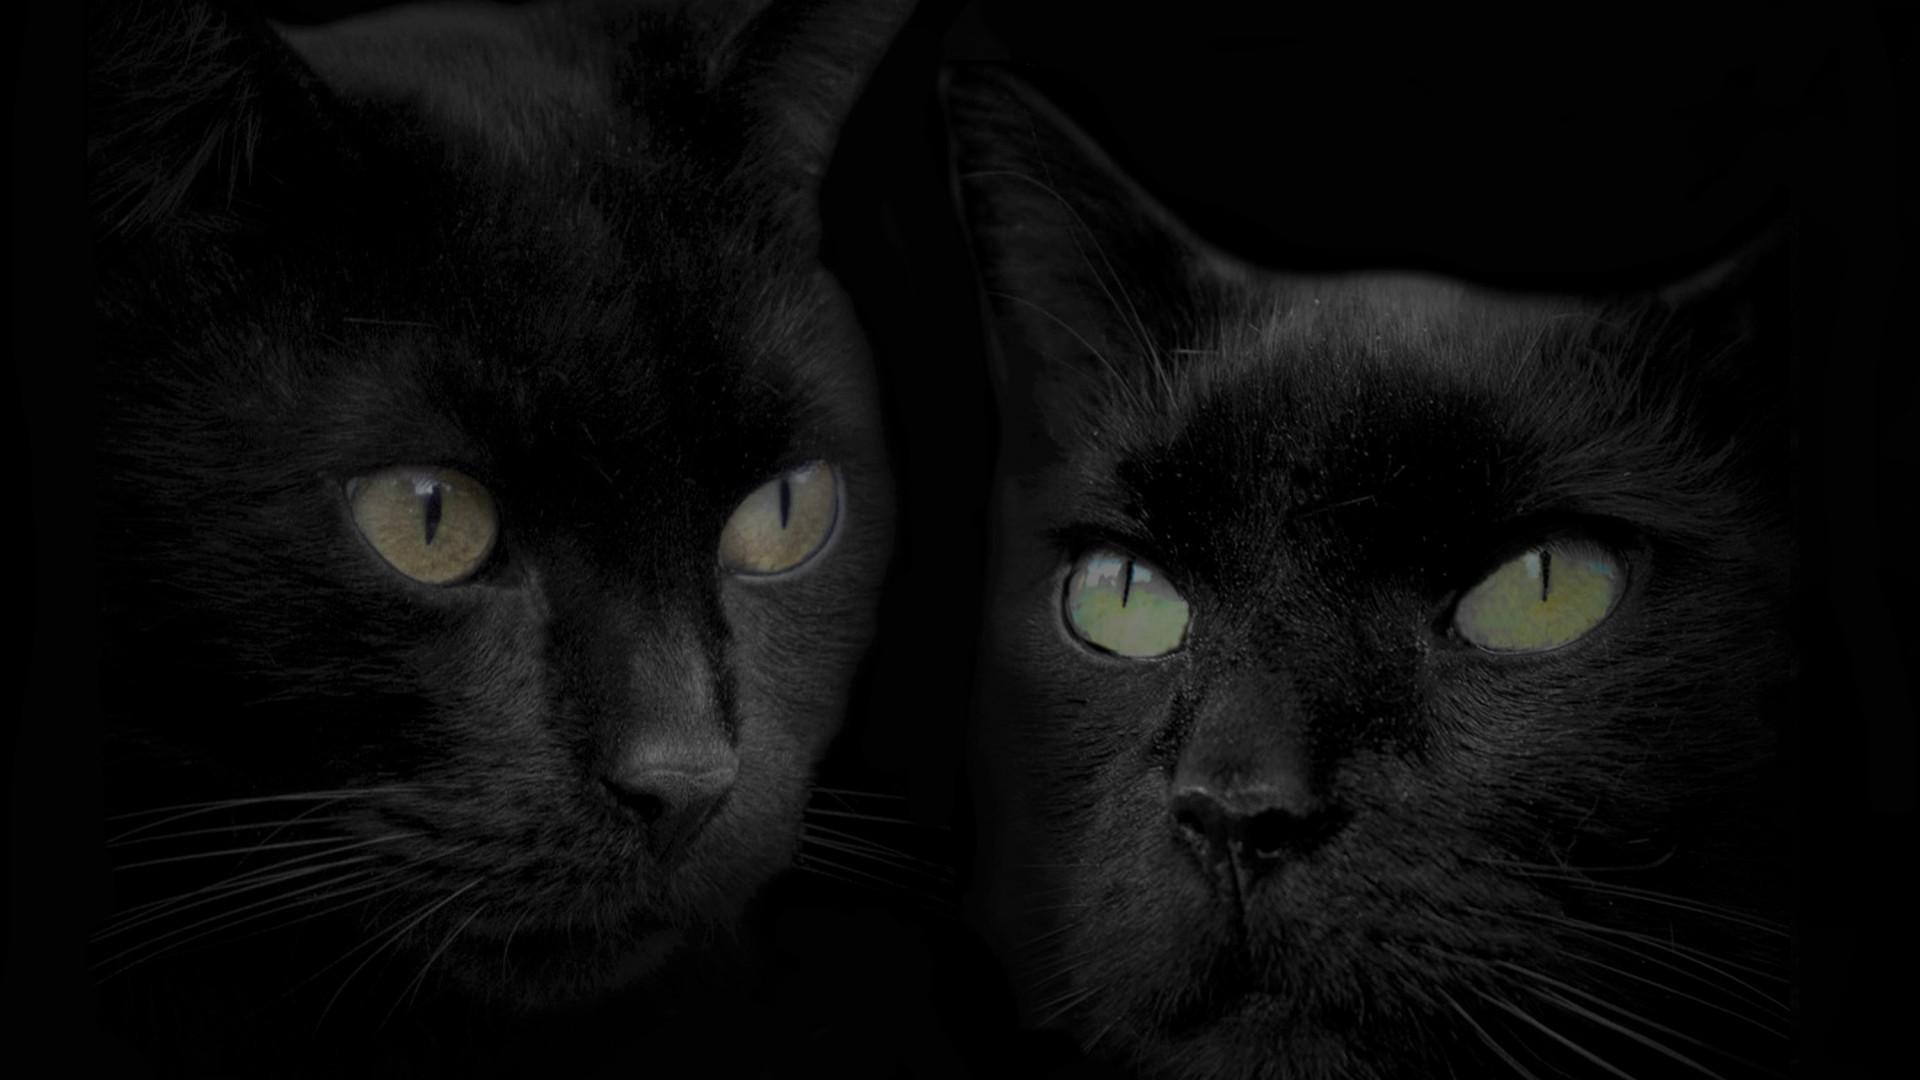 Black Cat background hd